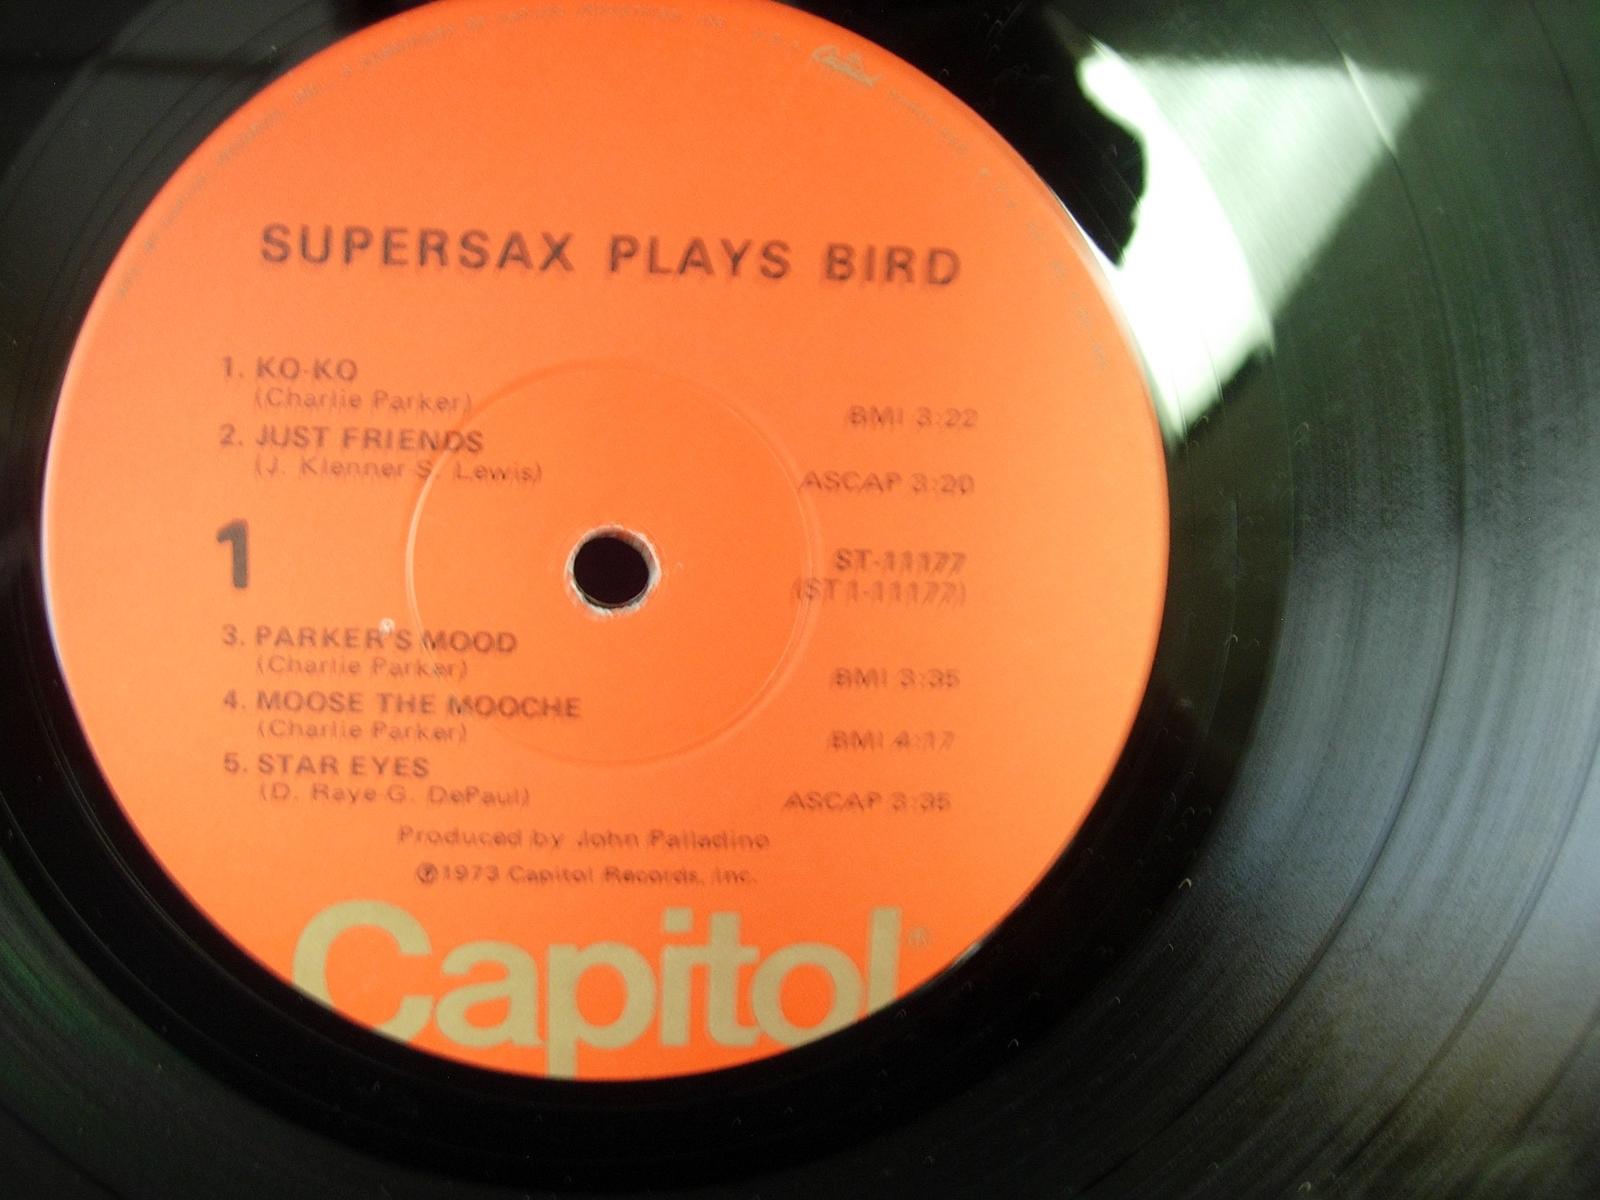 Supersax plays Bird - Capitol ST-11177